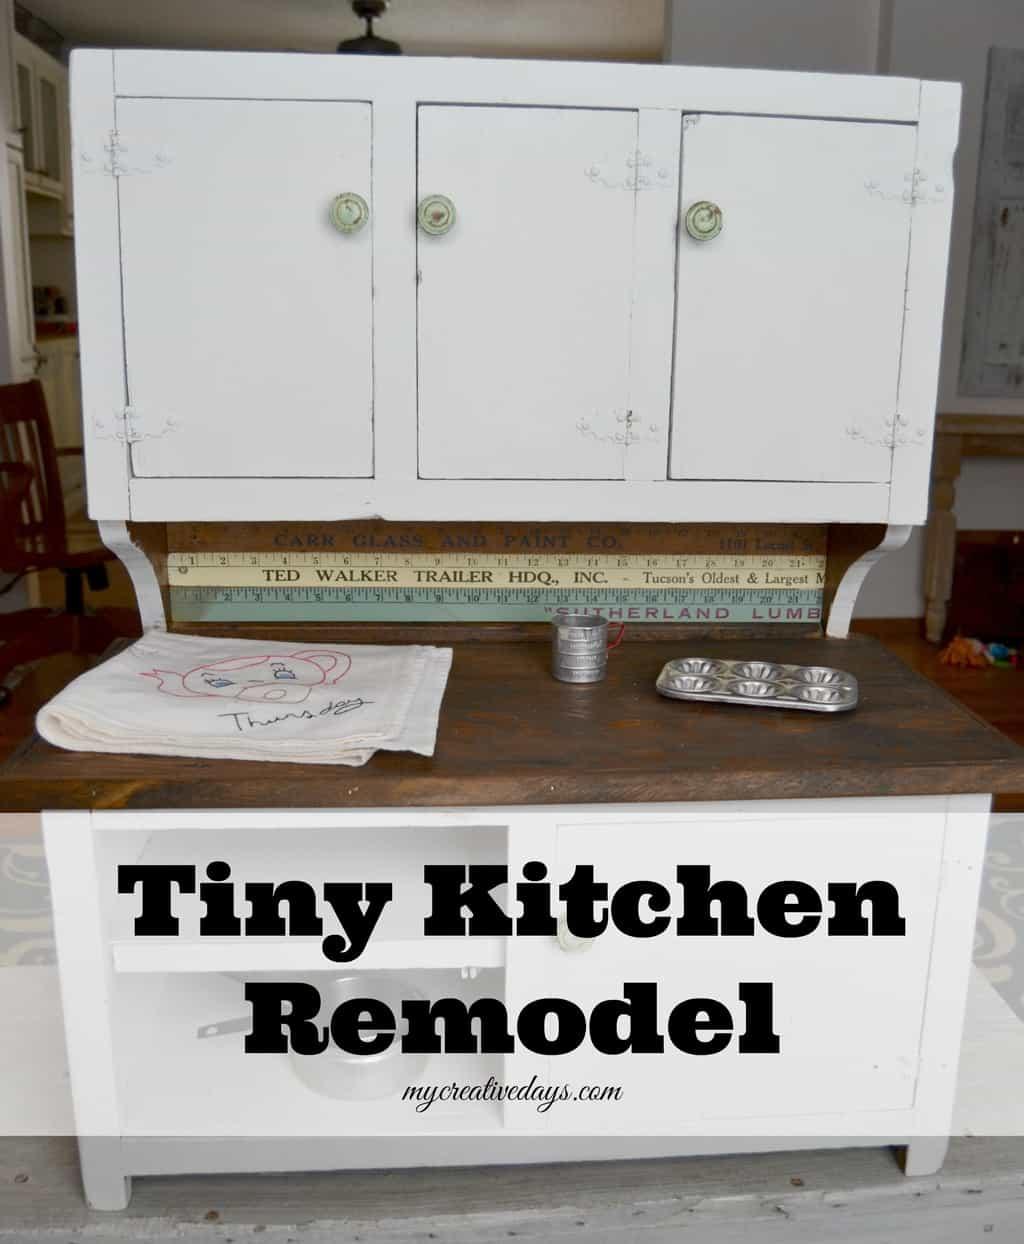 Tiny Kitchen Remodel mycreativedays.com